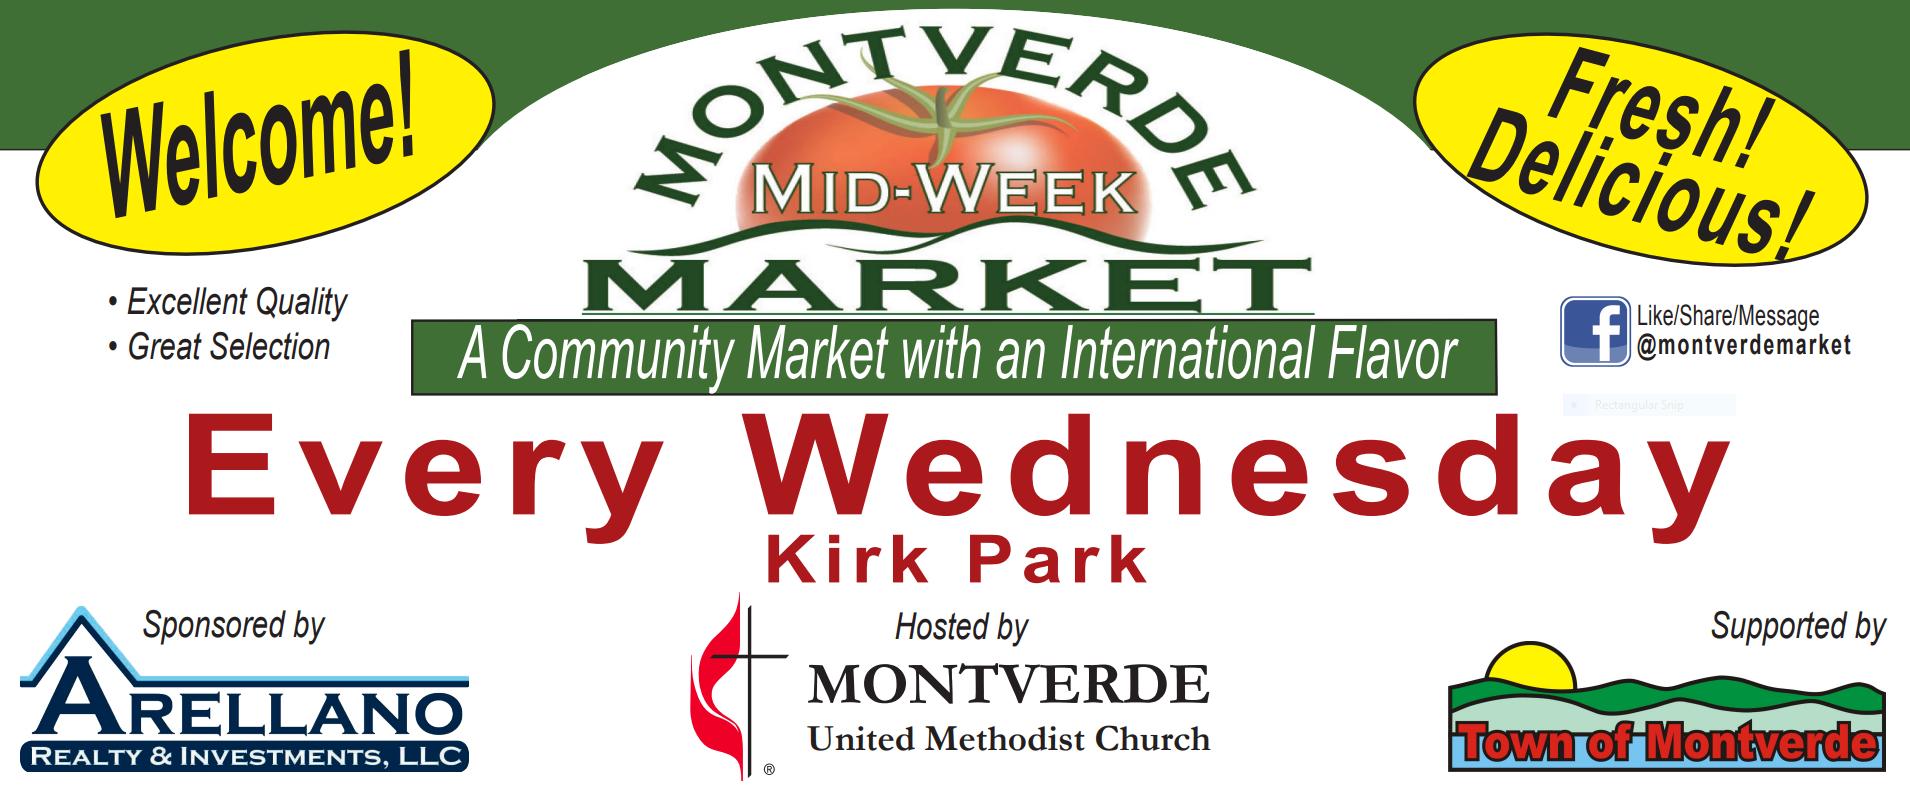 Montverde Market